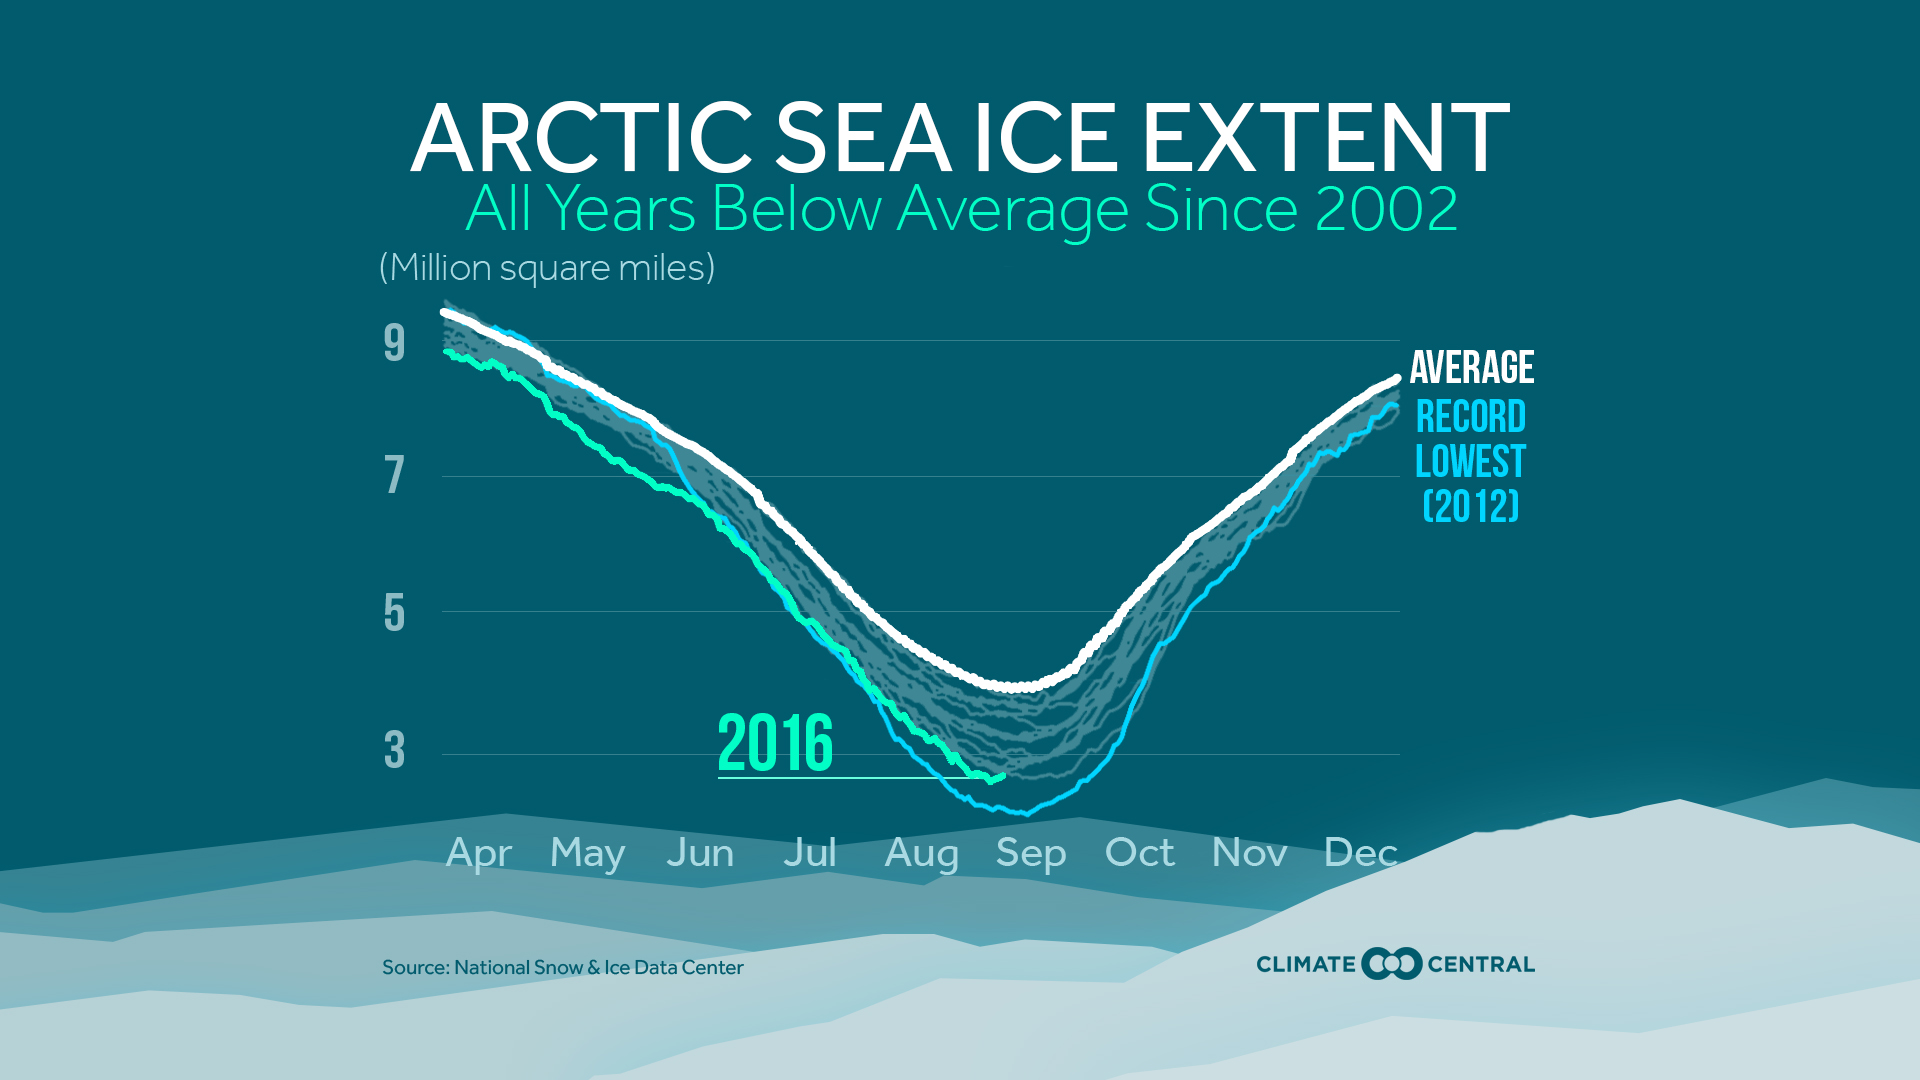 Arctic Sea Ice Extent Below Average Since 2002